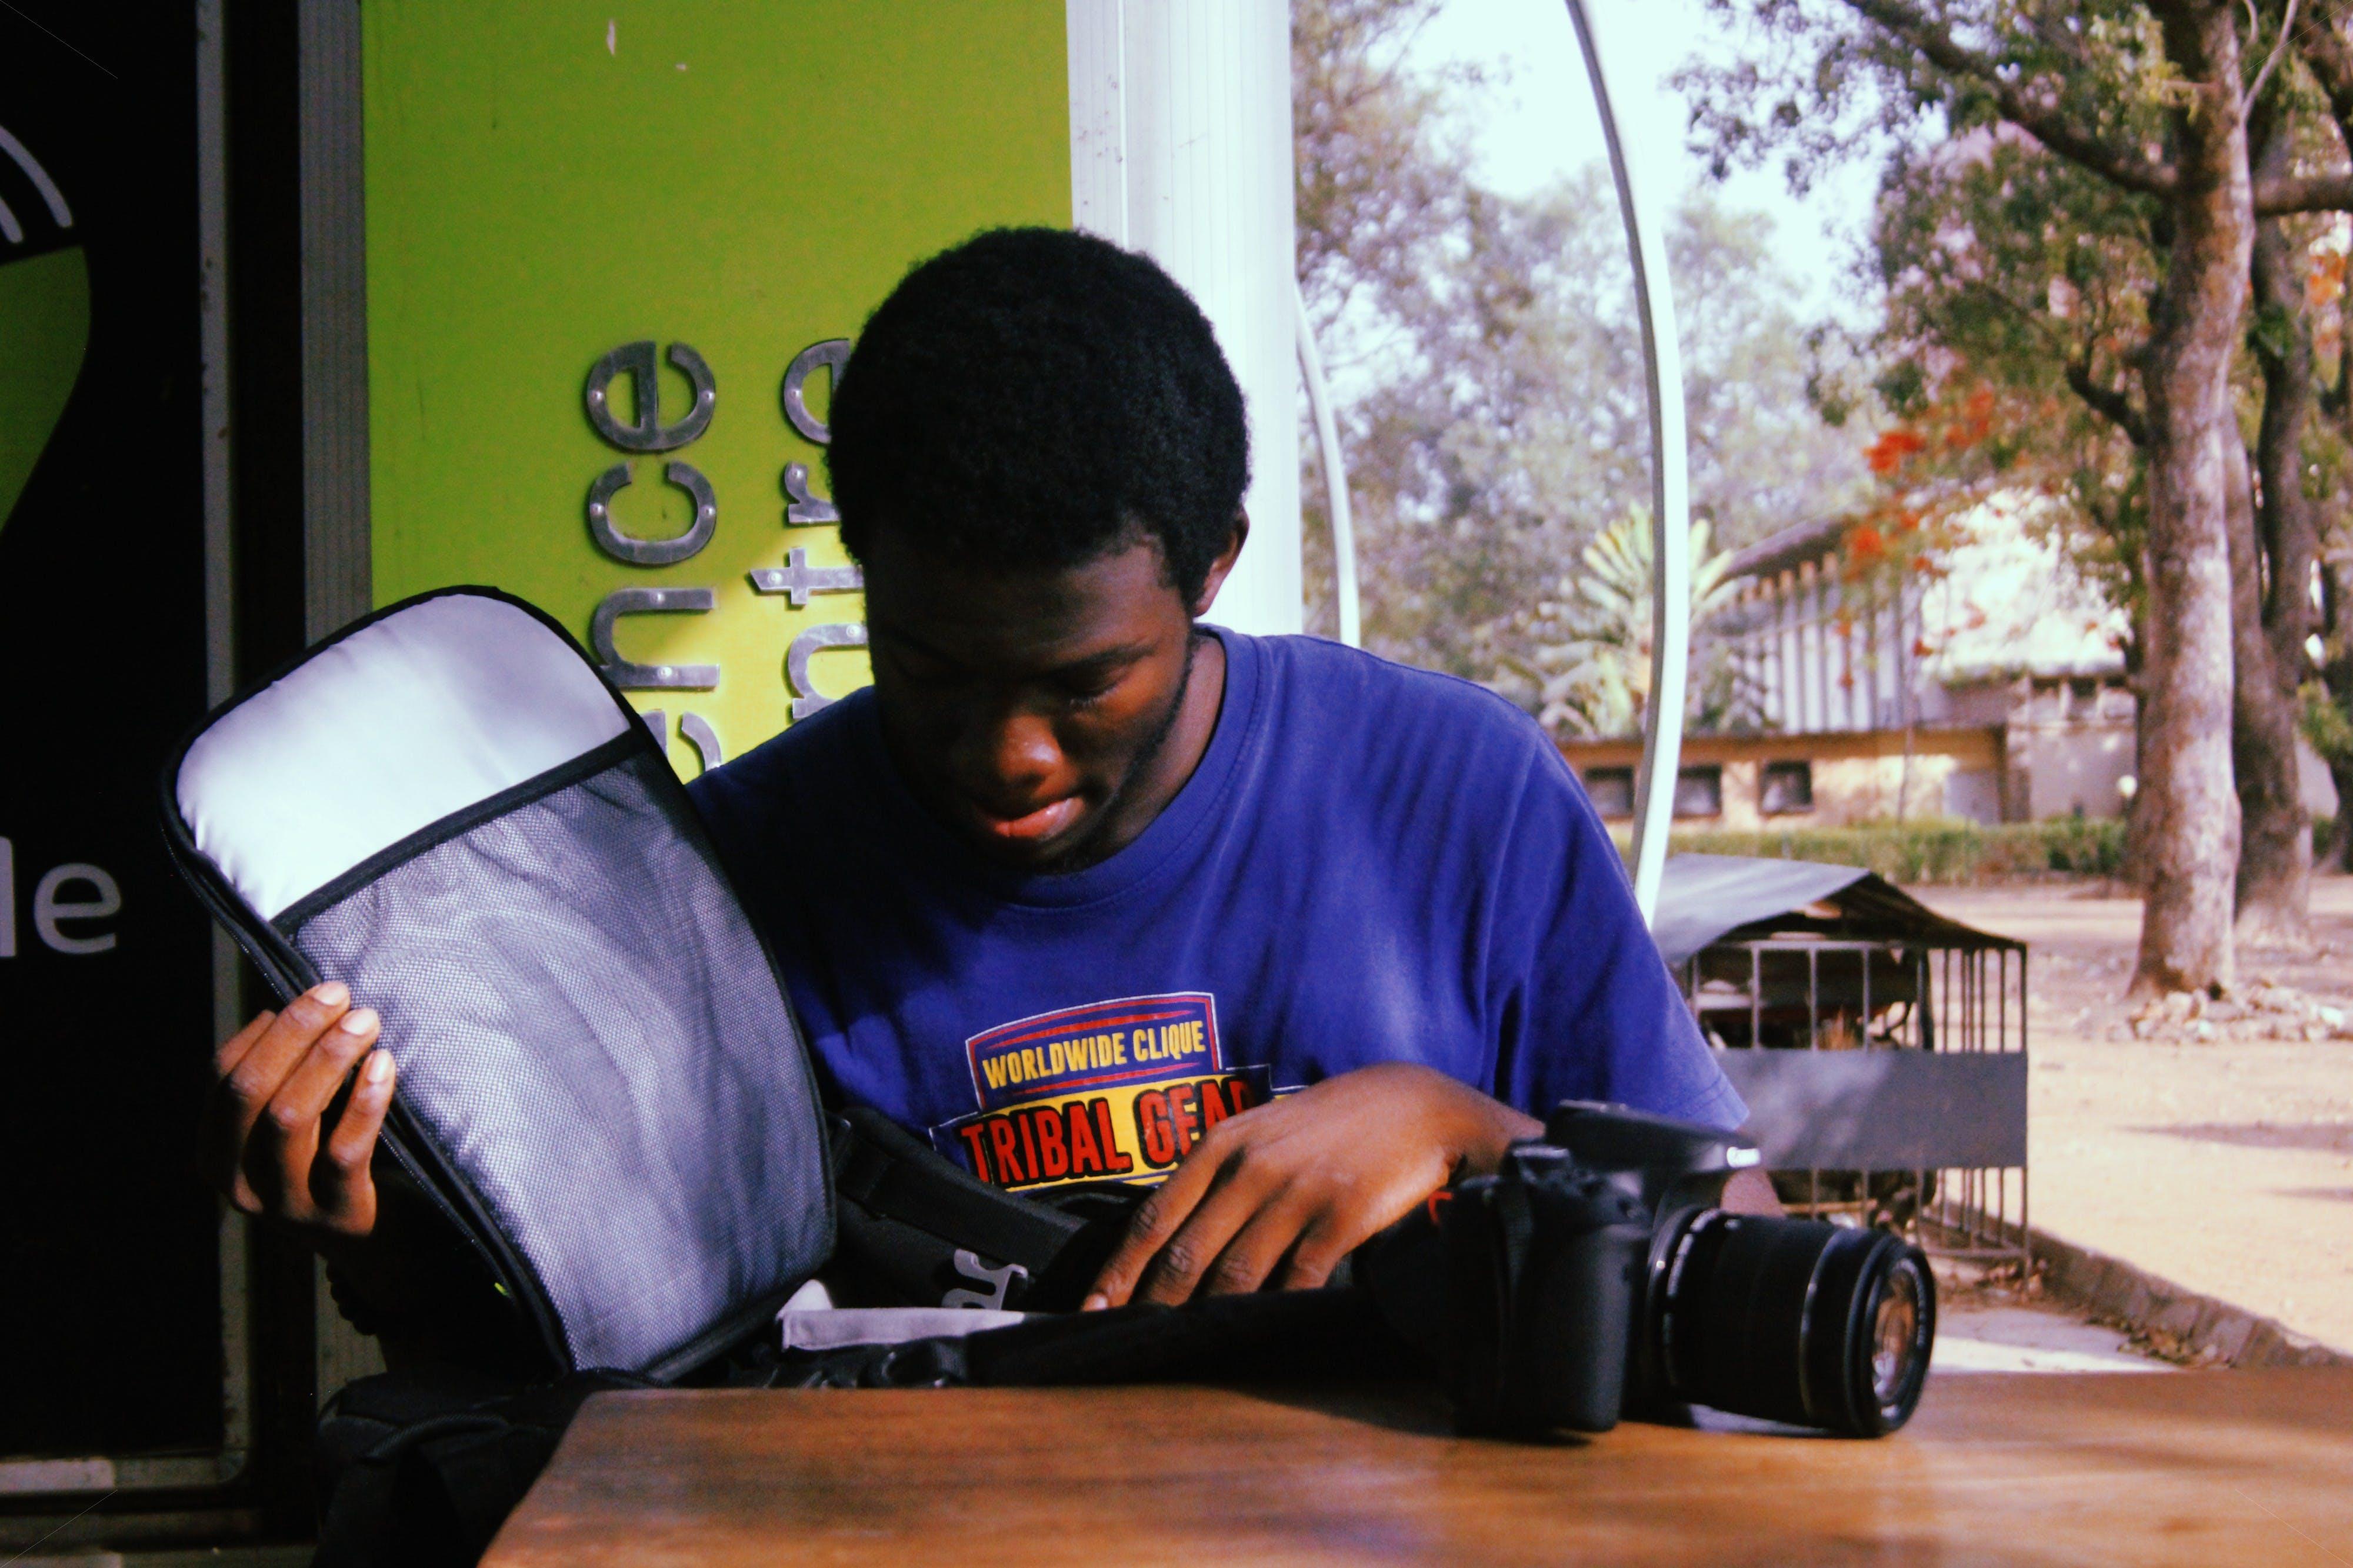 Gratis stockfoto met Afrikaans, Afro-Amerikaanse vrouw, apparaat, binnenshuis